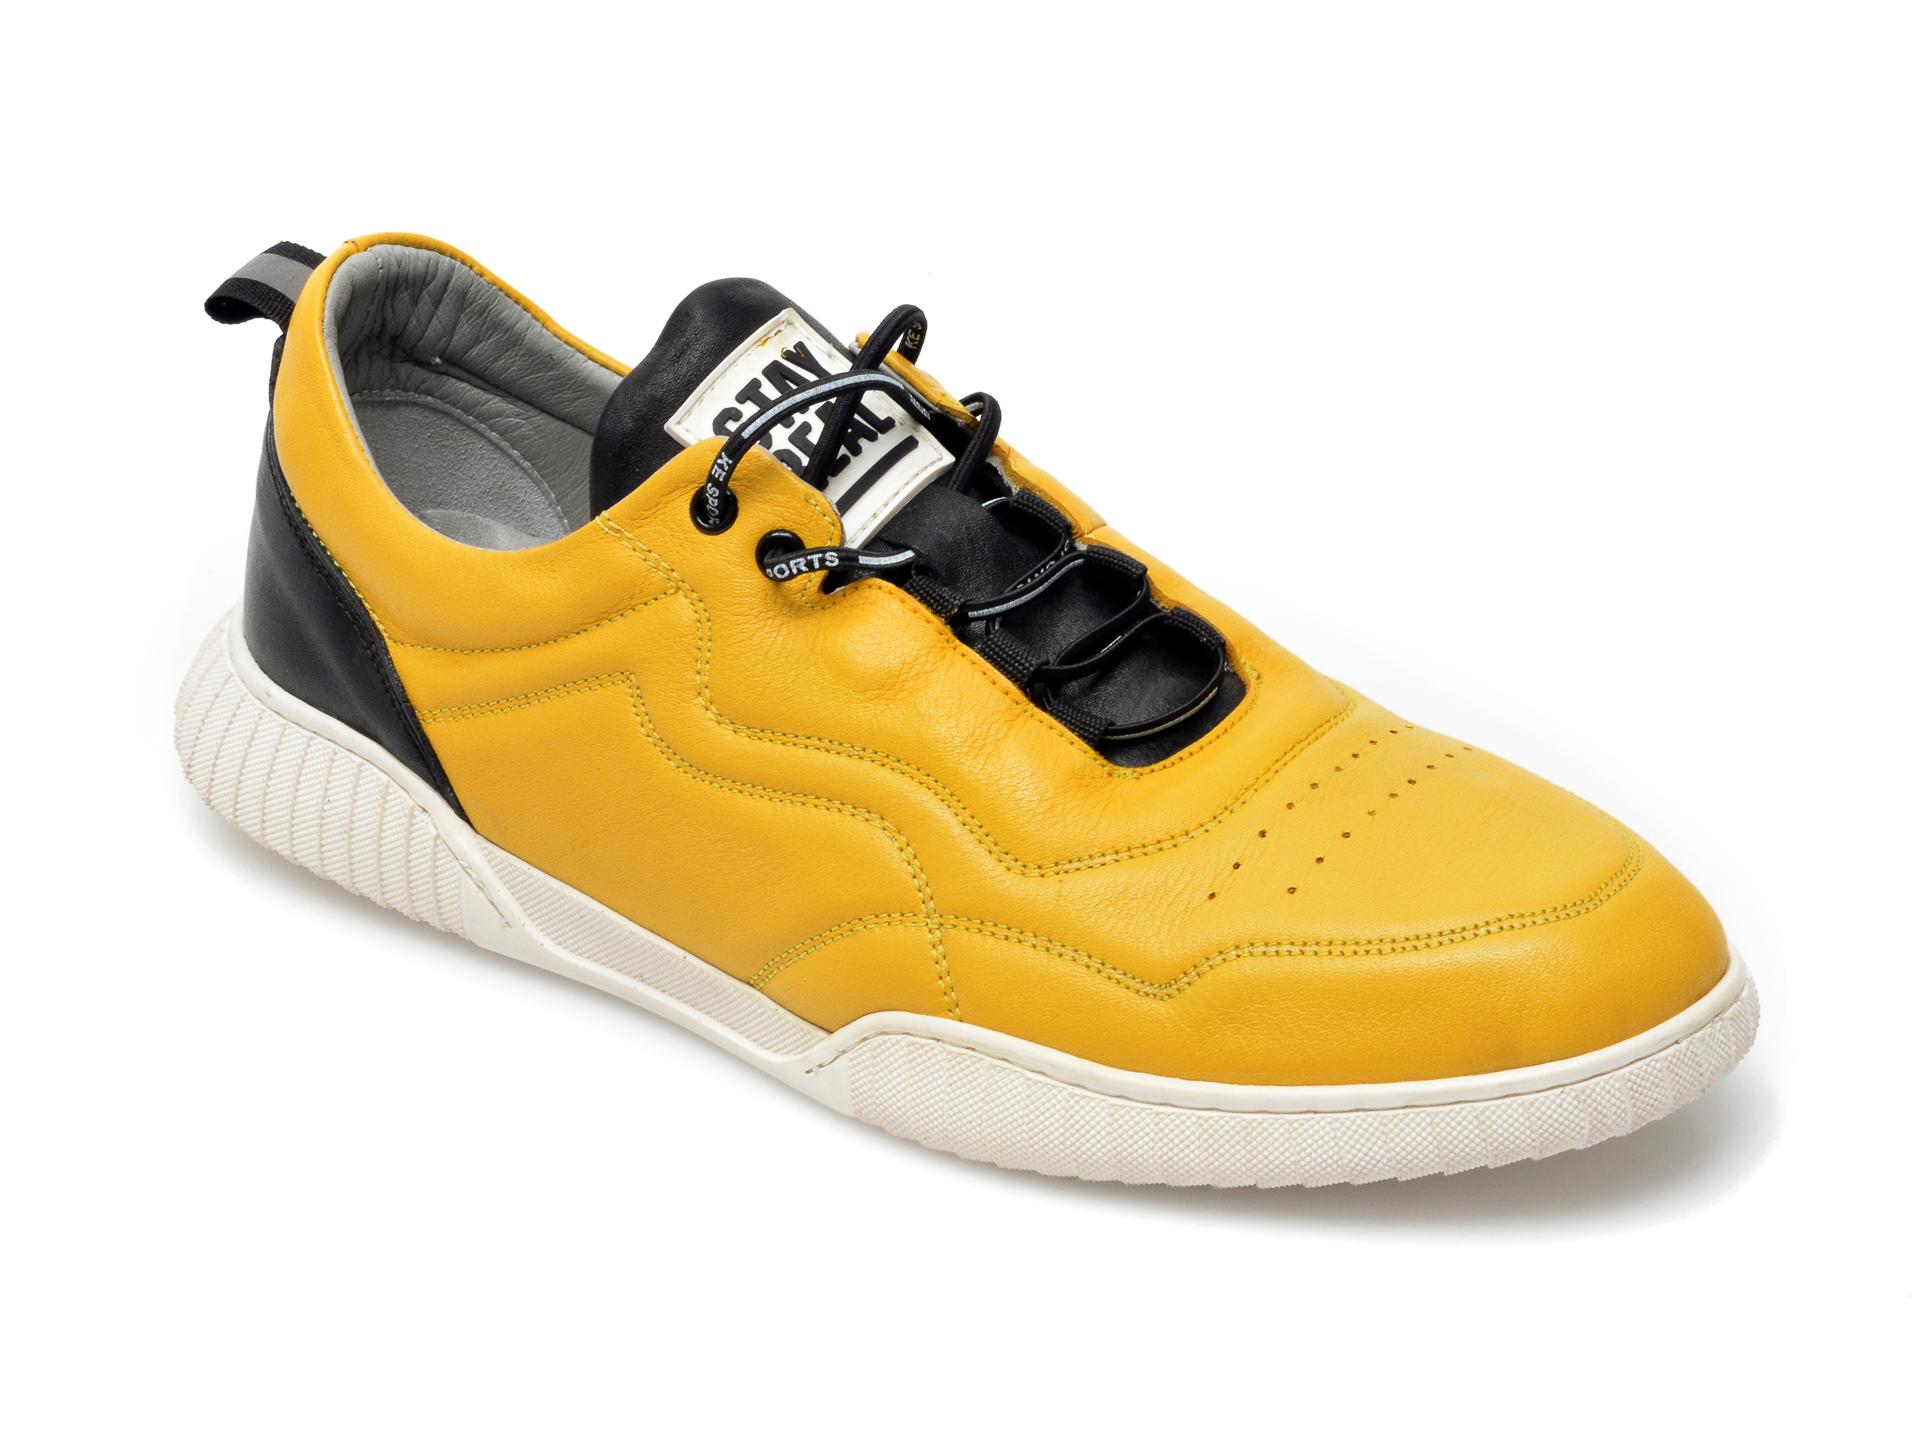 Pantofi sport OTTER galbeni, 24204, din piele naturala imagine